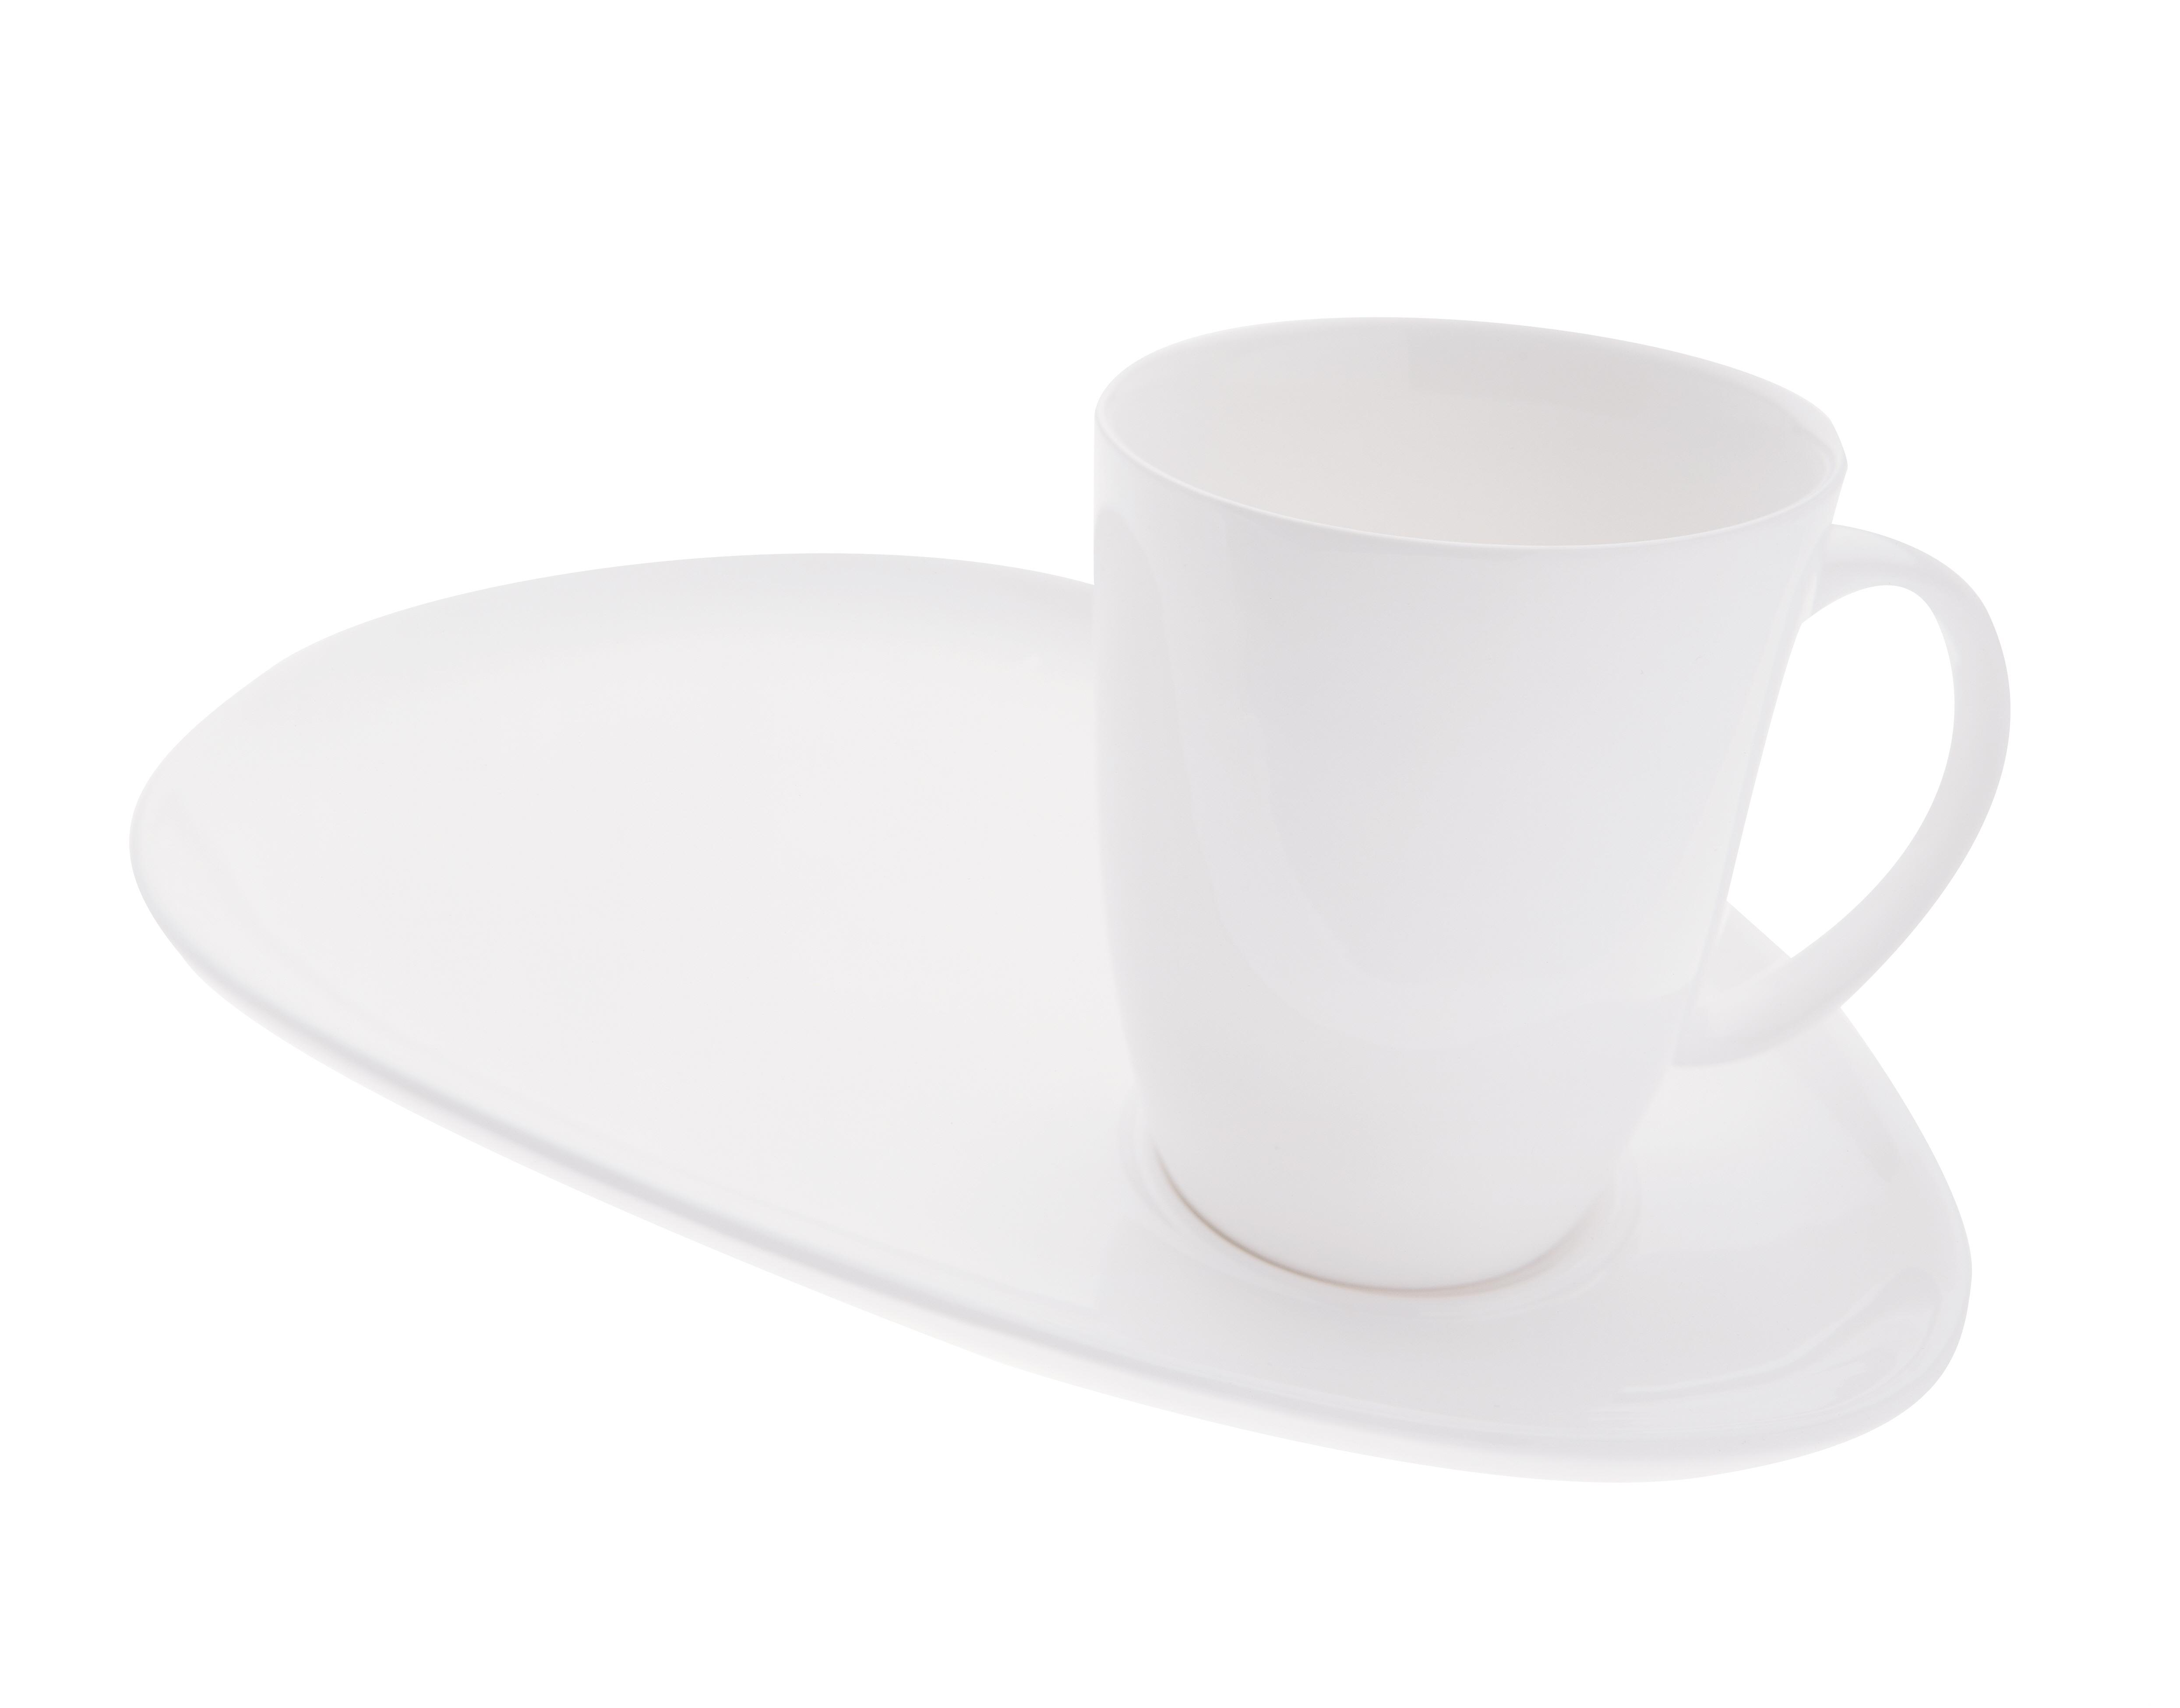 Cana cu farfurie White Basics Alb, Portelan